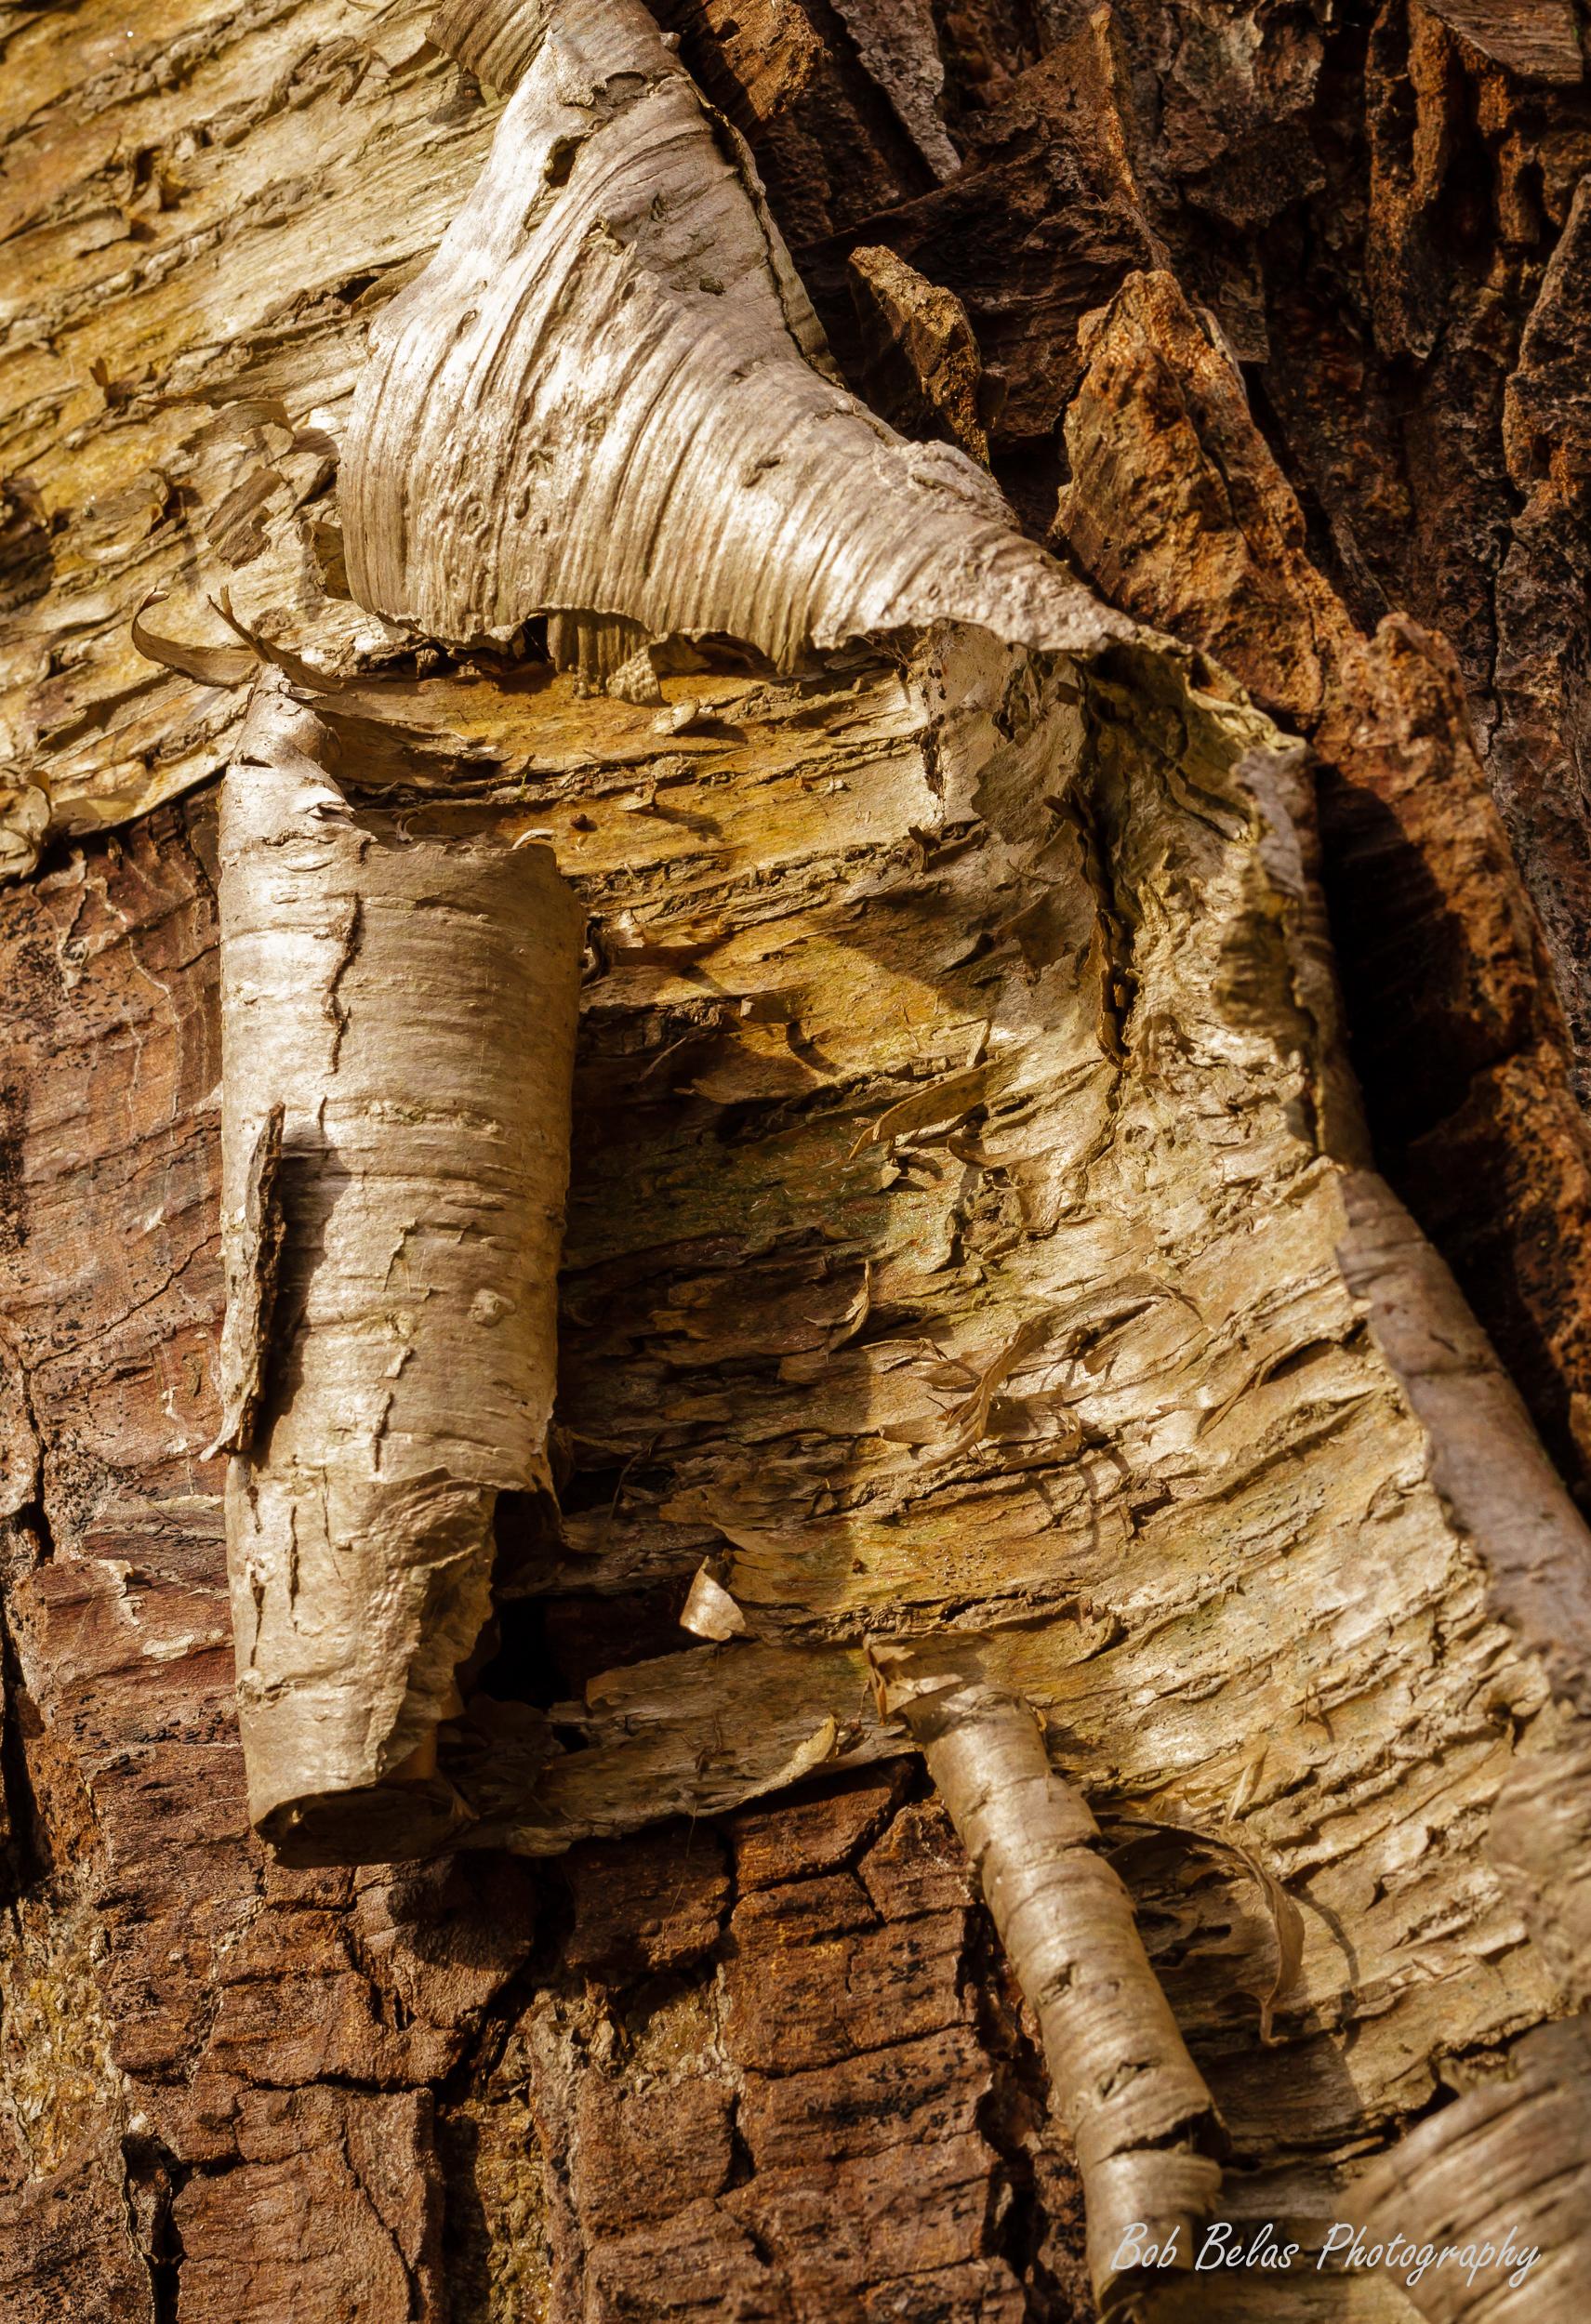 Coils of Bark